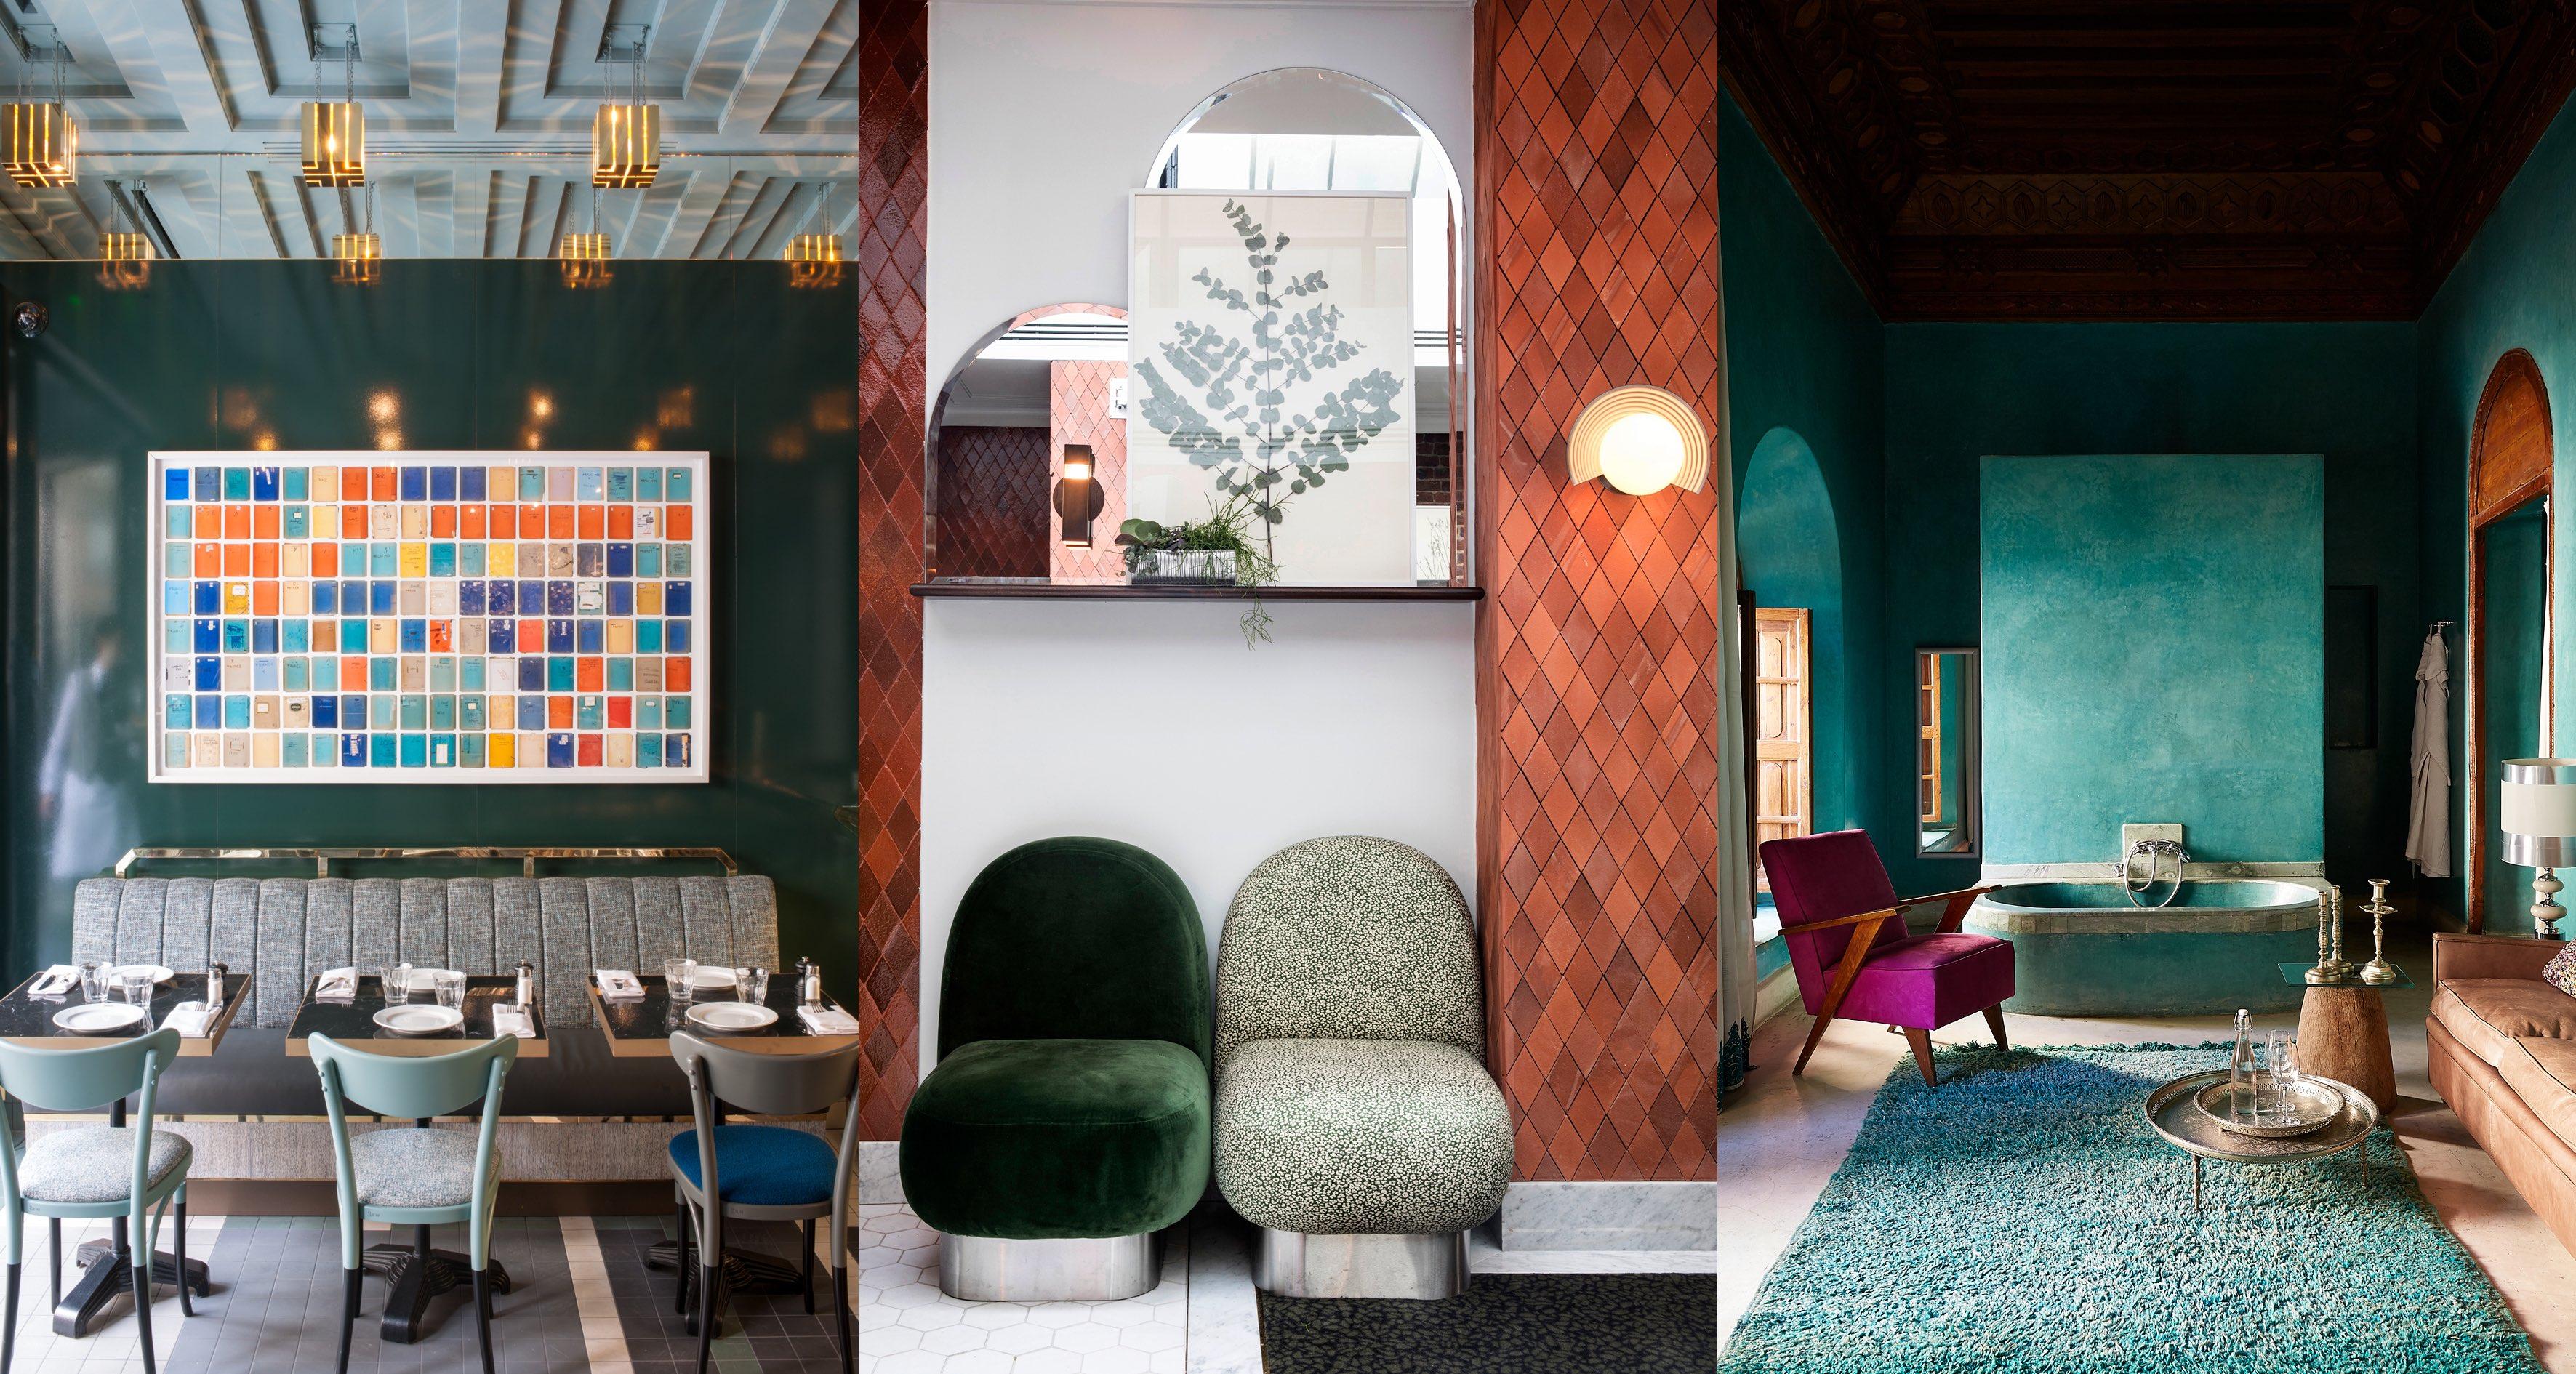 Kate Interieur Design Impressies.30s Magazine Weekendtip Salon Residence